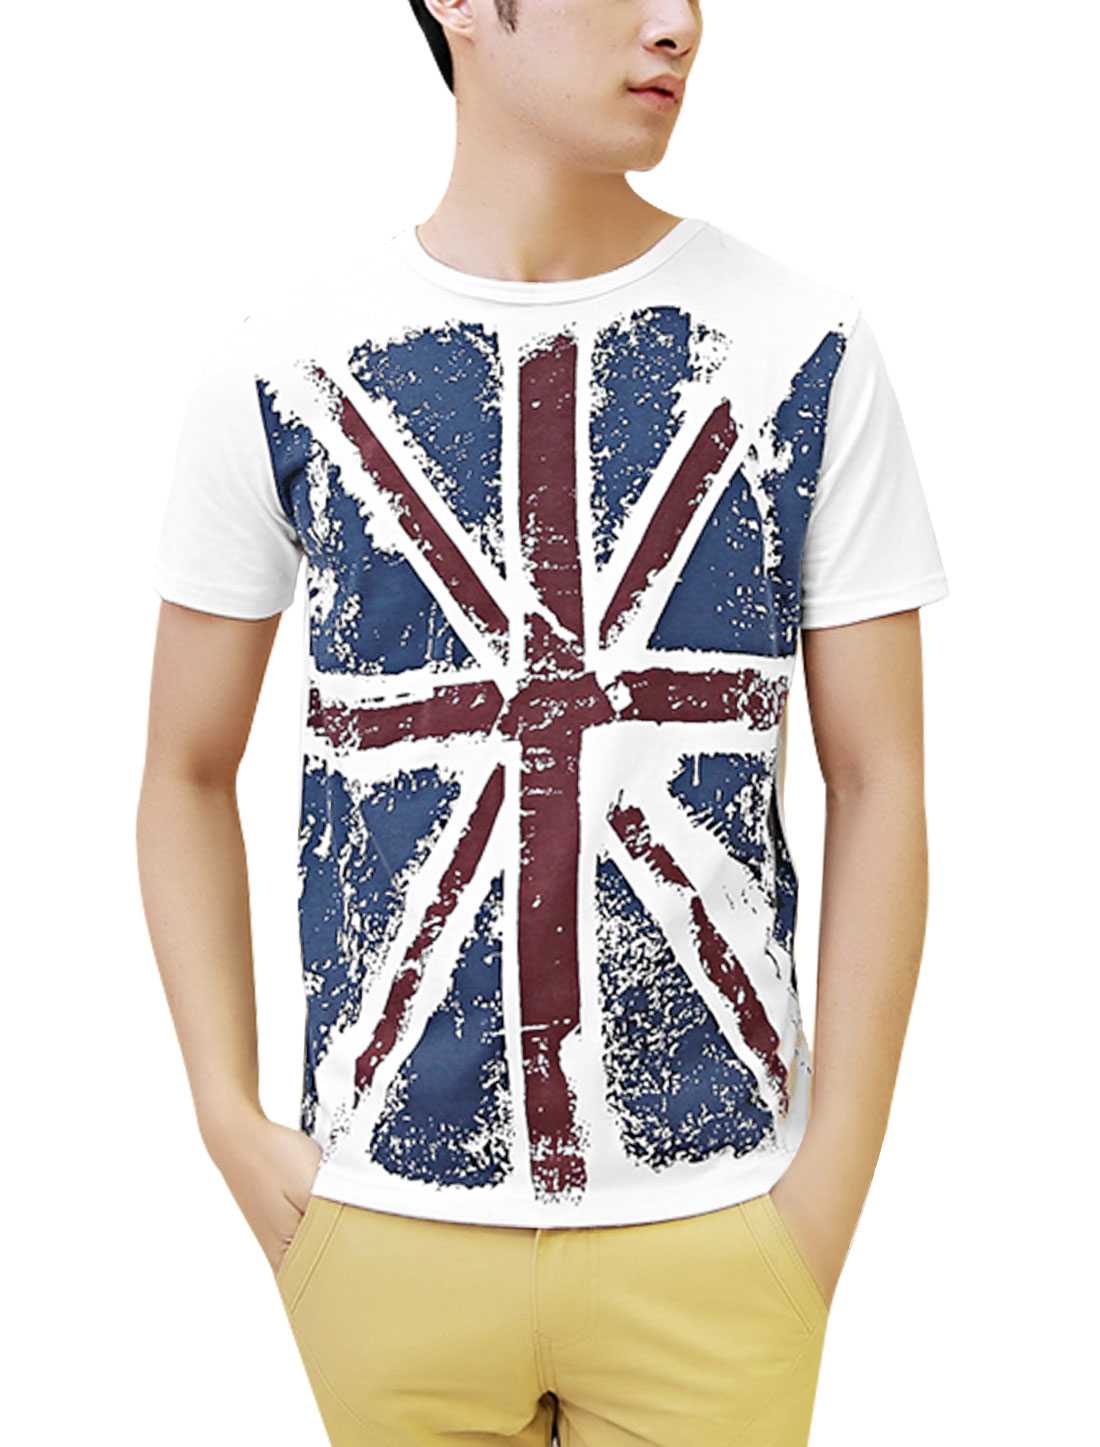 Man British Flag Print Short Sleeve Pullover Tee Shirt White L